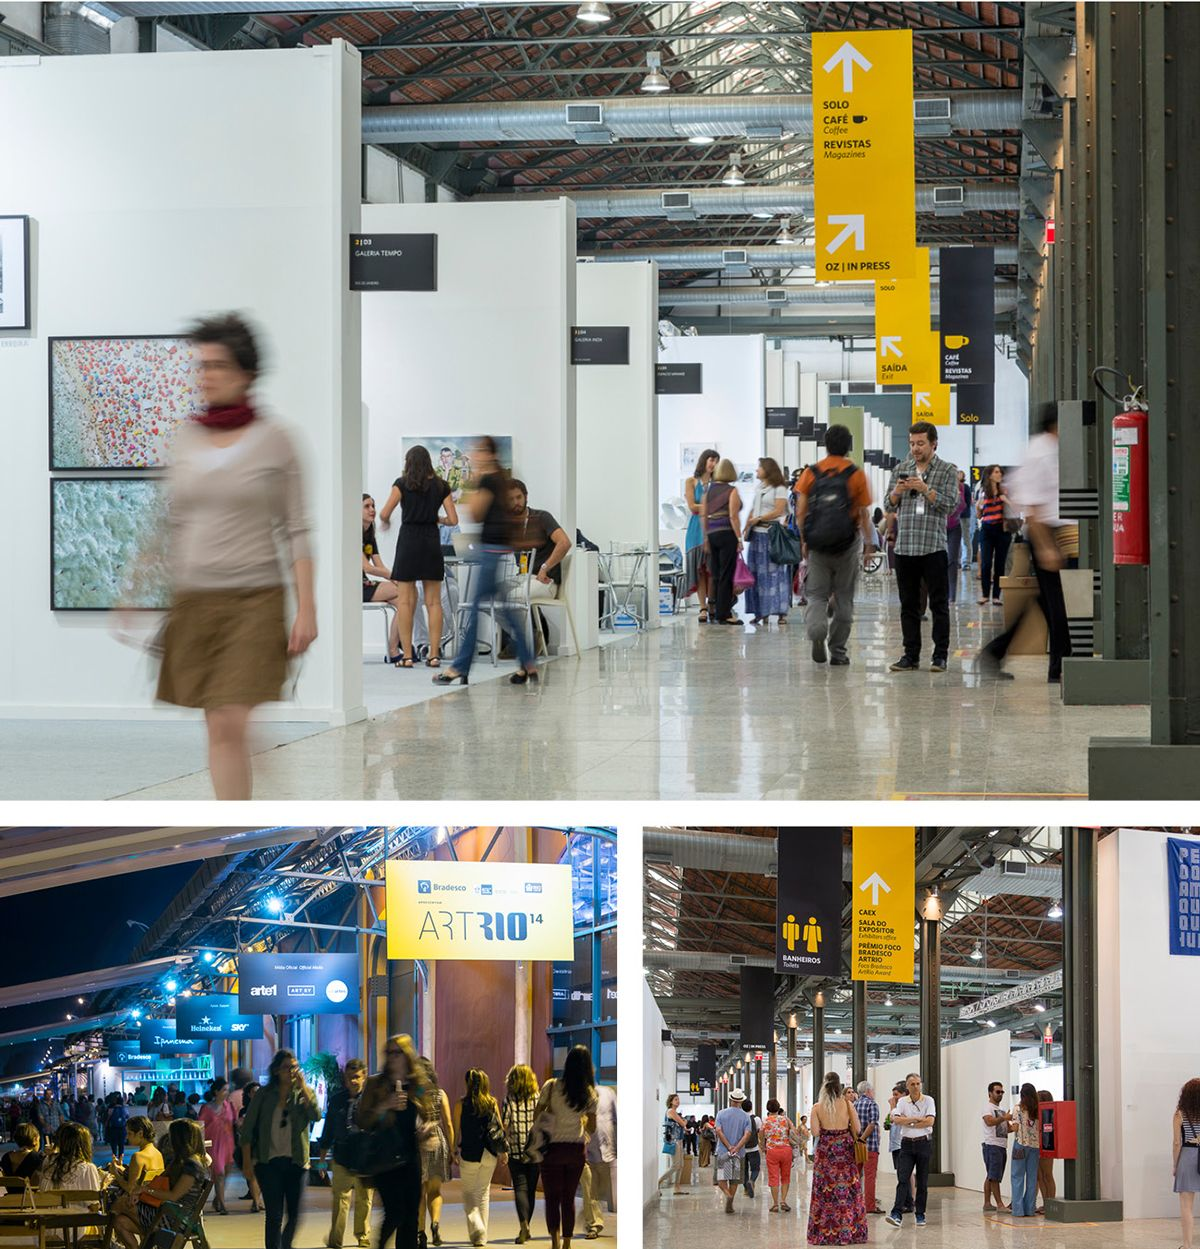 ArtRio - International Art Fair of Rio de Janeiro on Behance